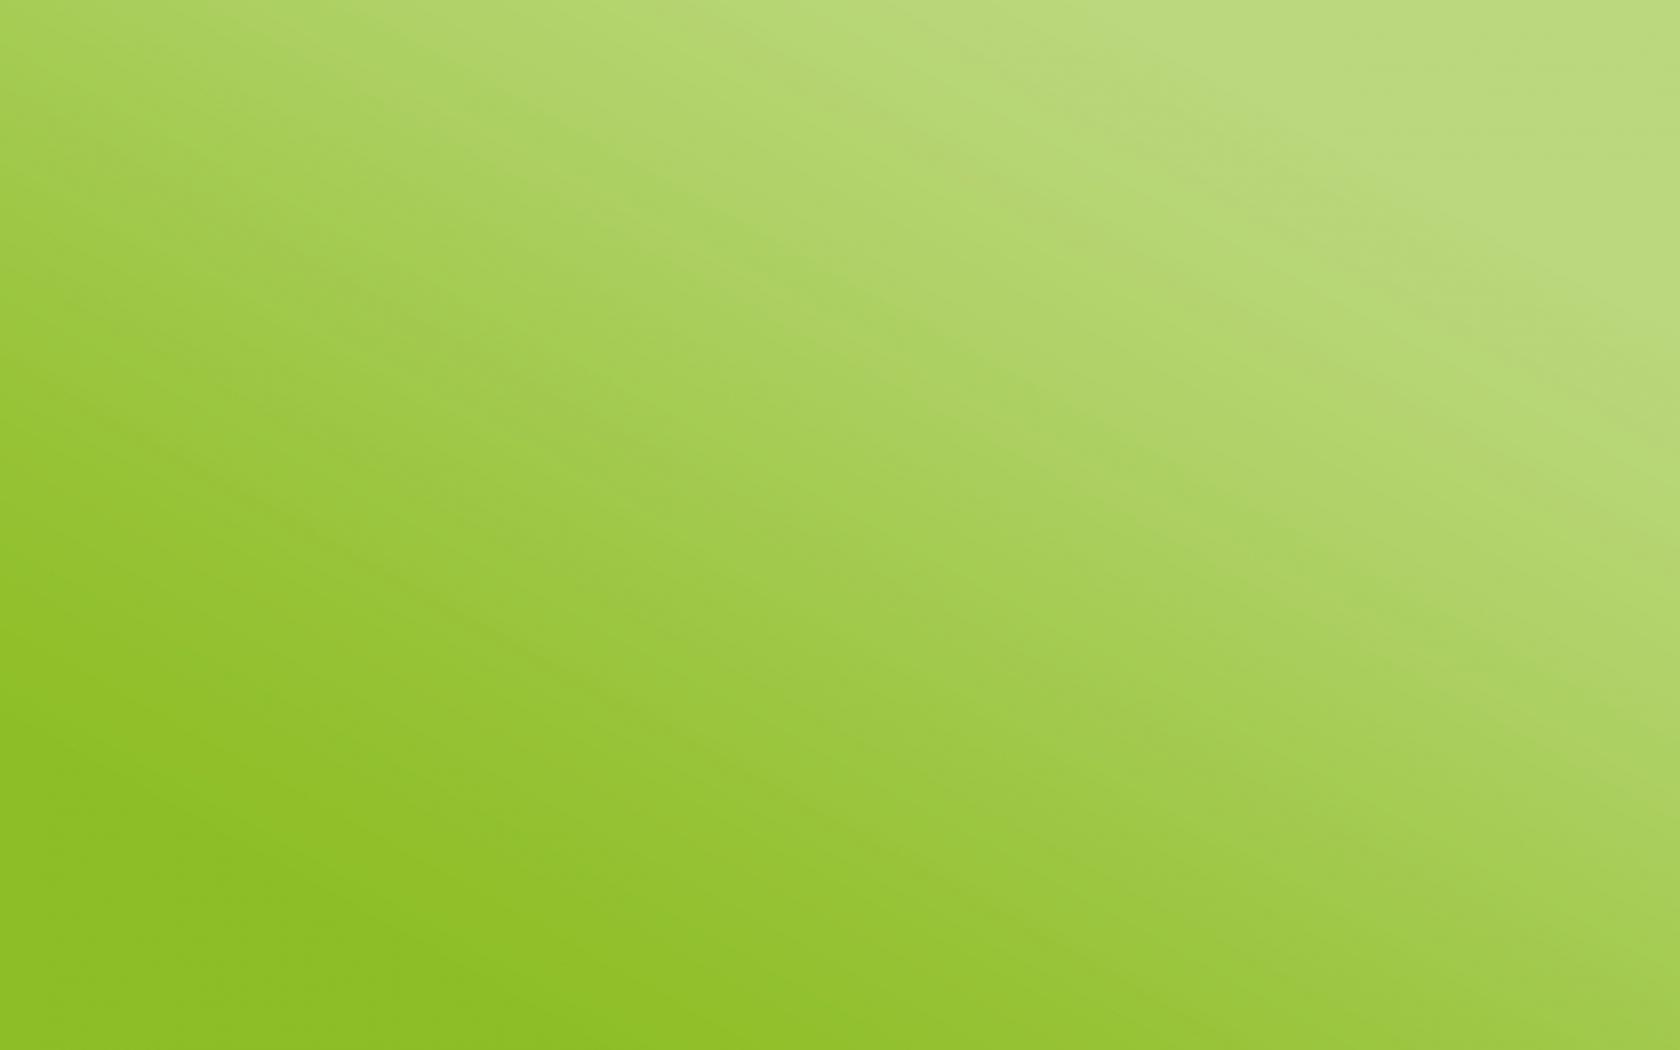 light green background 31850